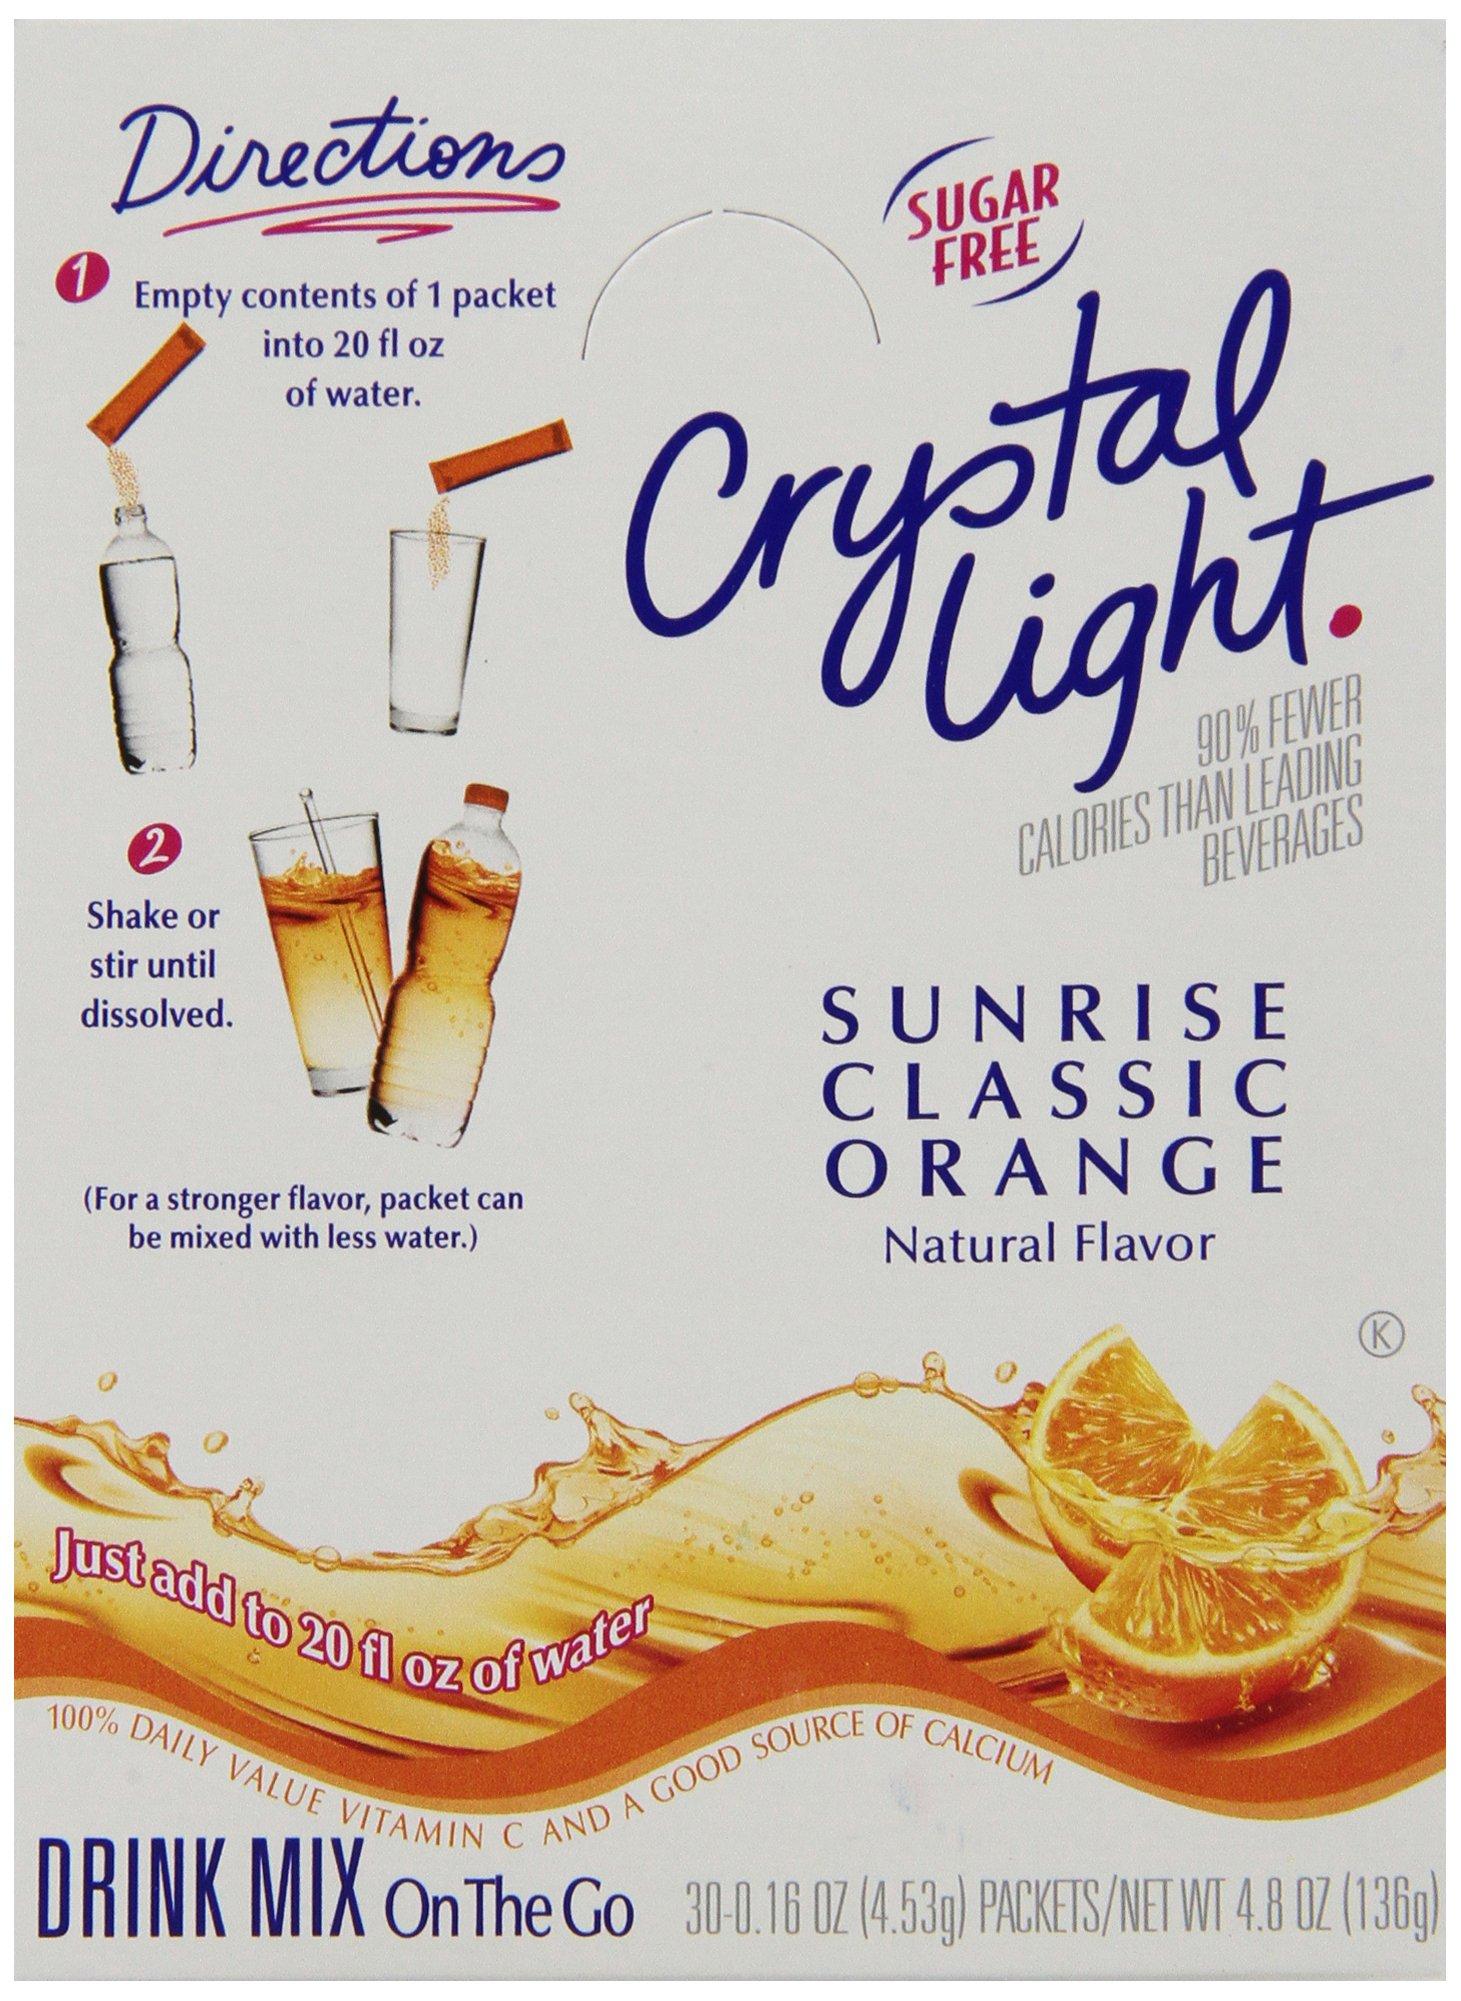 Crystal Light On-the-Go Sunrise Orange Mix, 2.4 oz. pack, Pack of 30